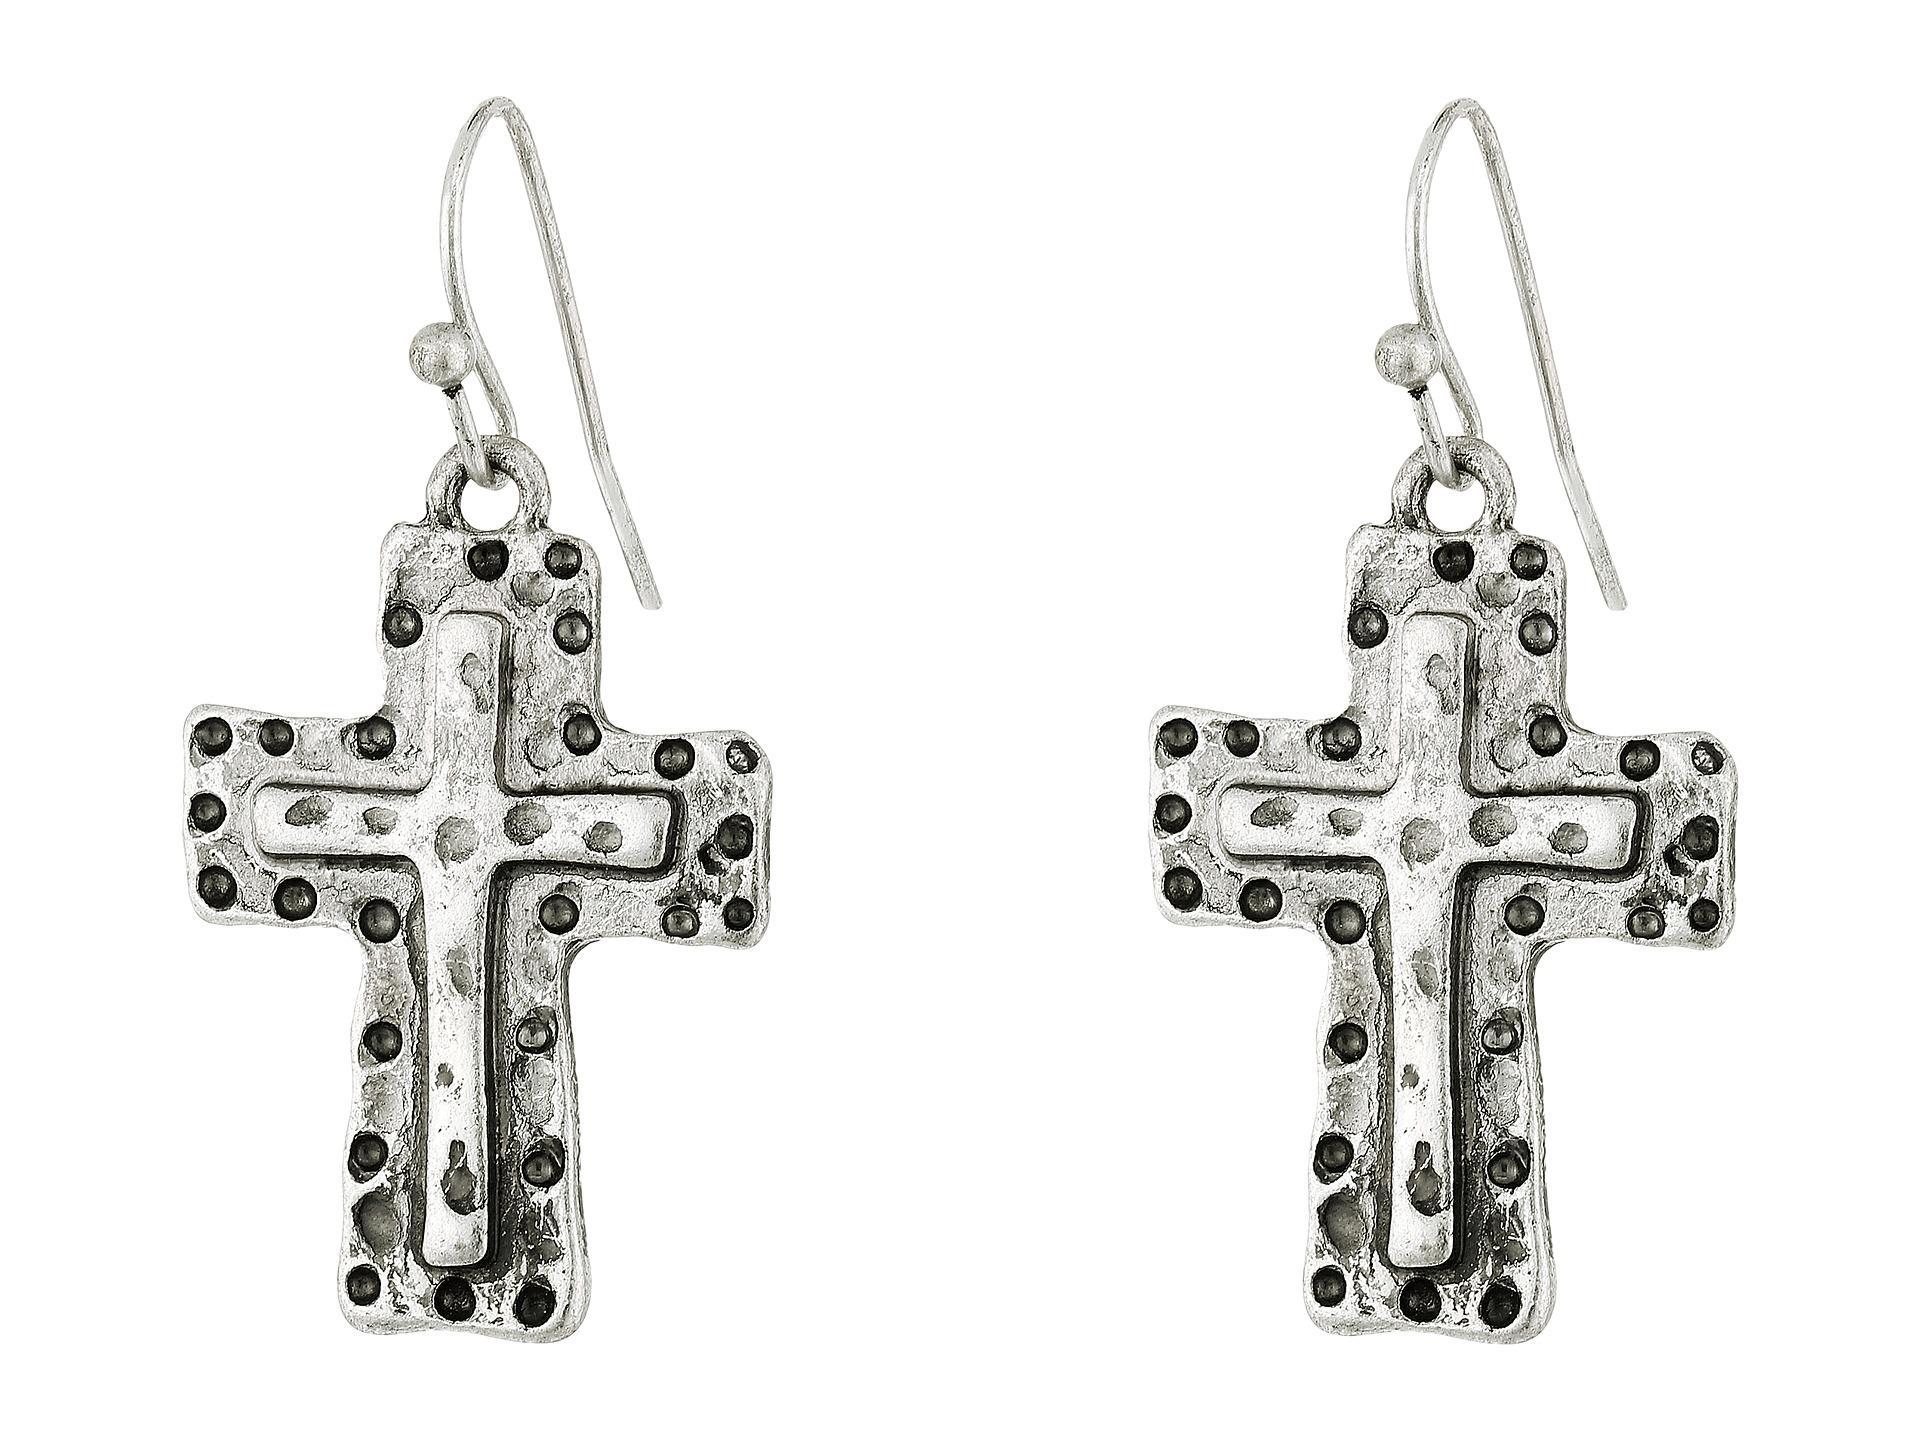 m f western hammered cross bracelet earrings set at zappos